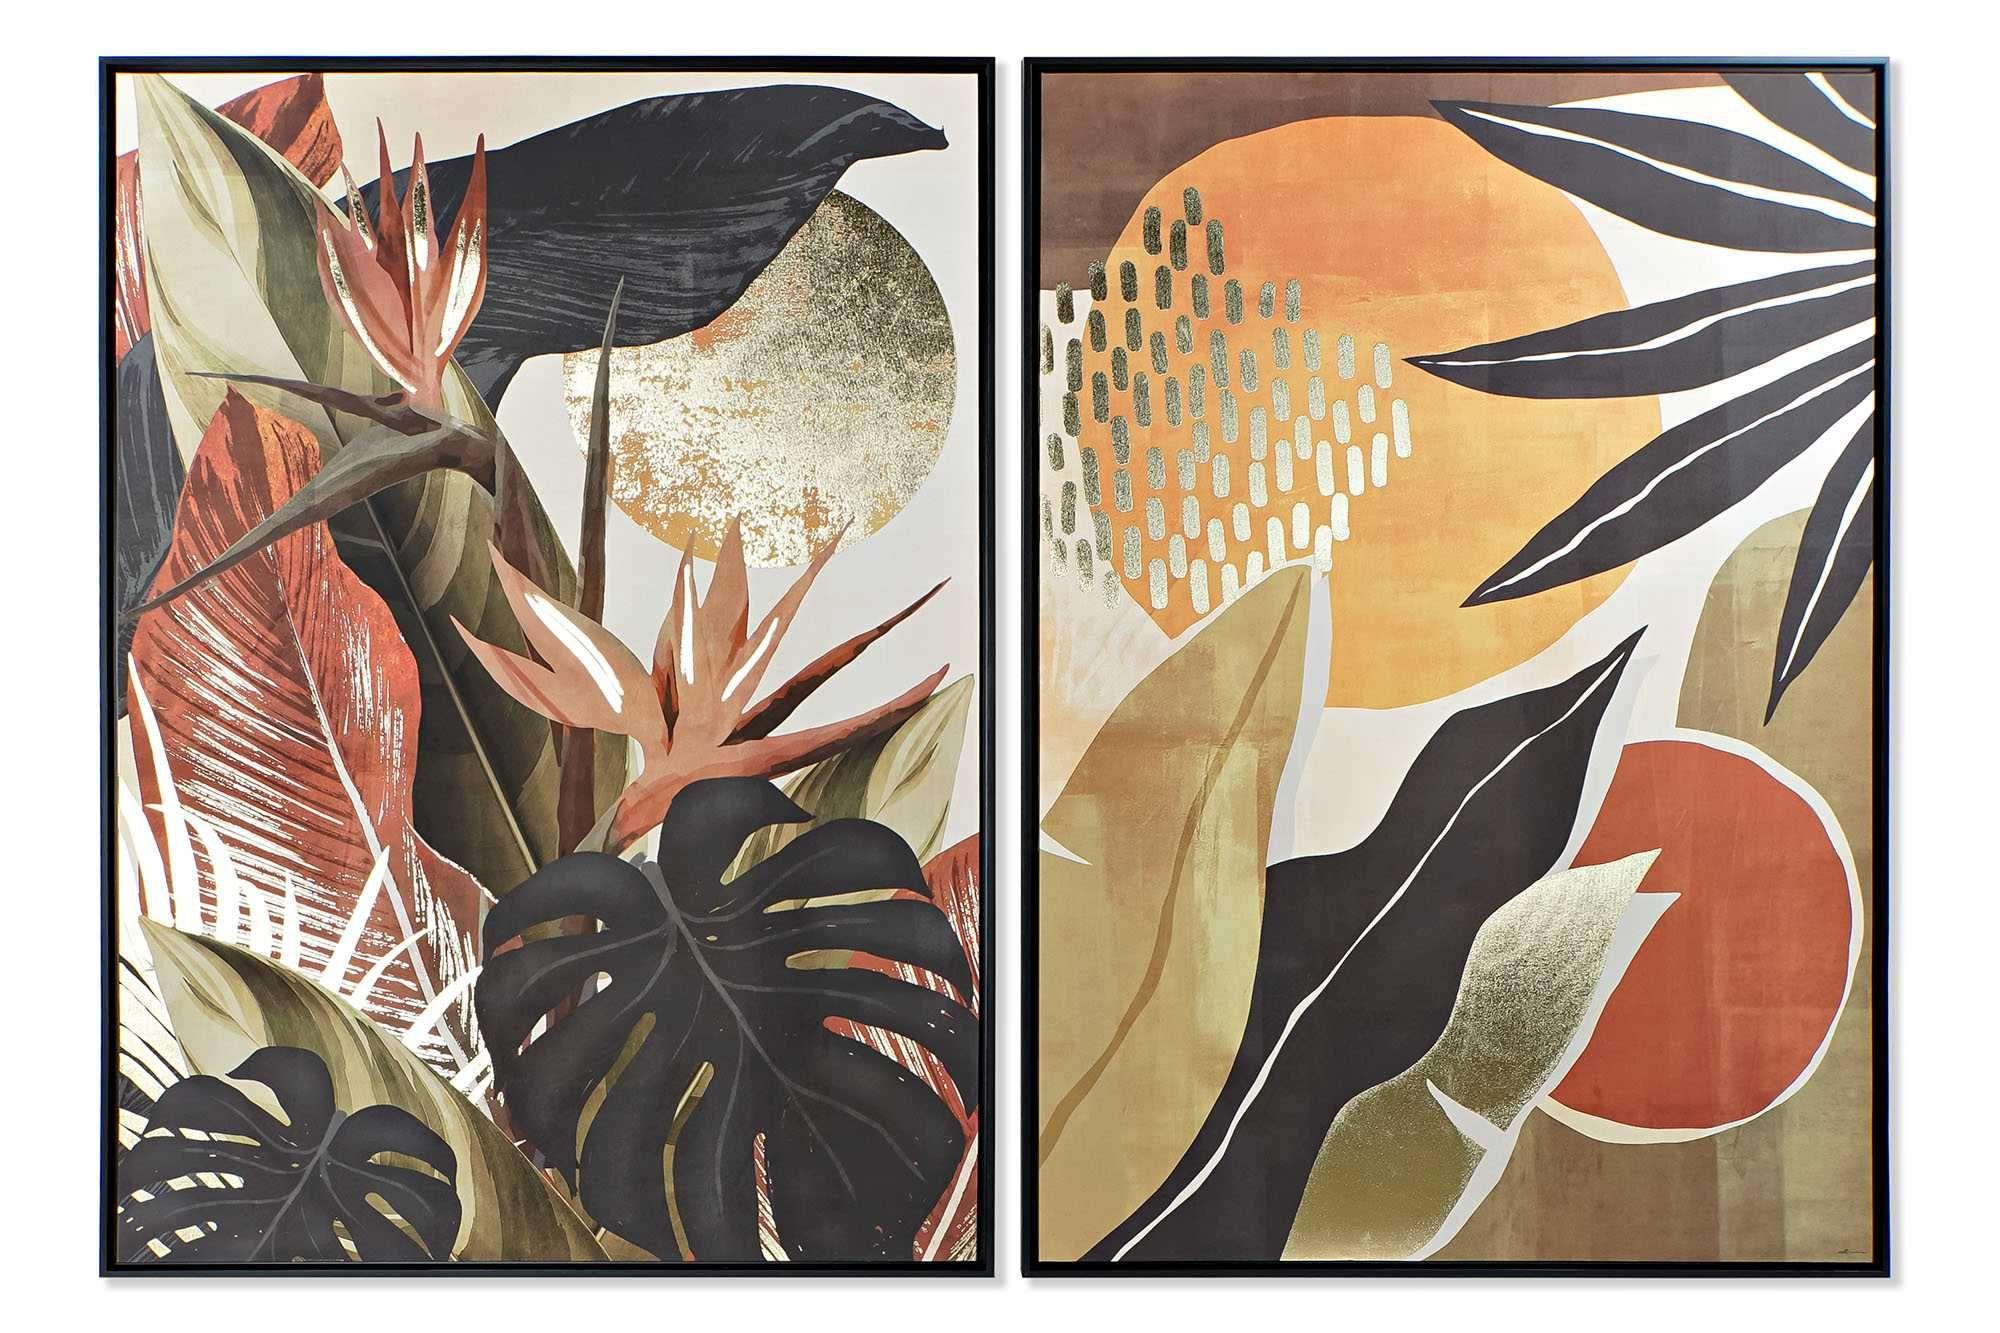 Quadro abstracto Tropical 2 modelos - 103,5X4,5X144cm By Arcoazul